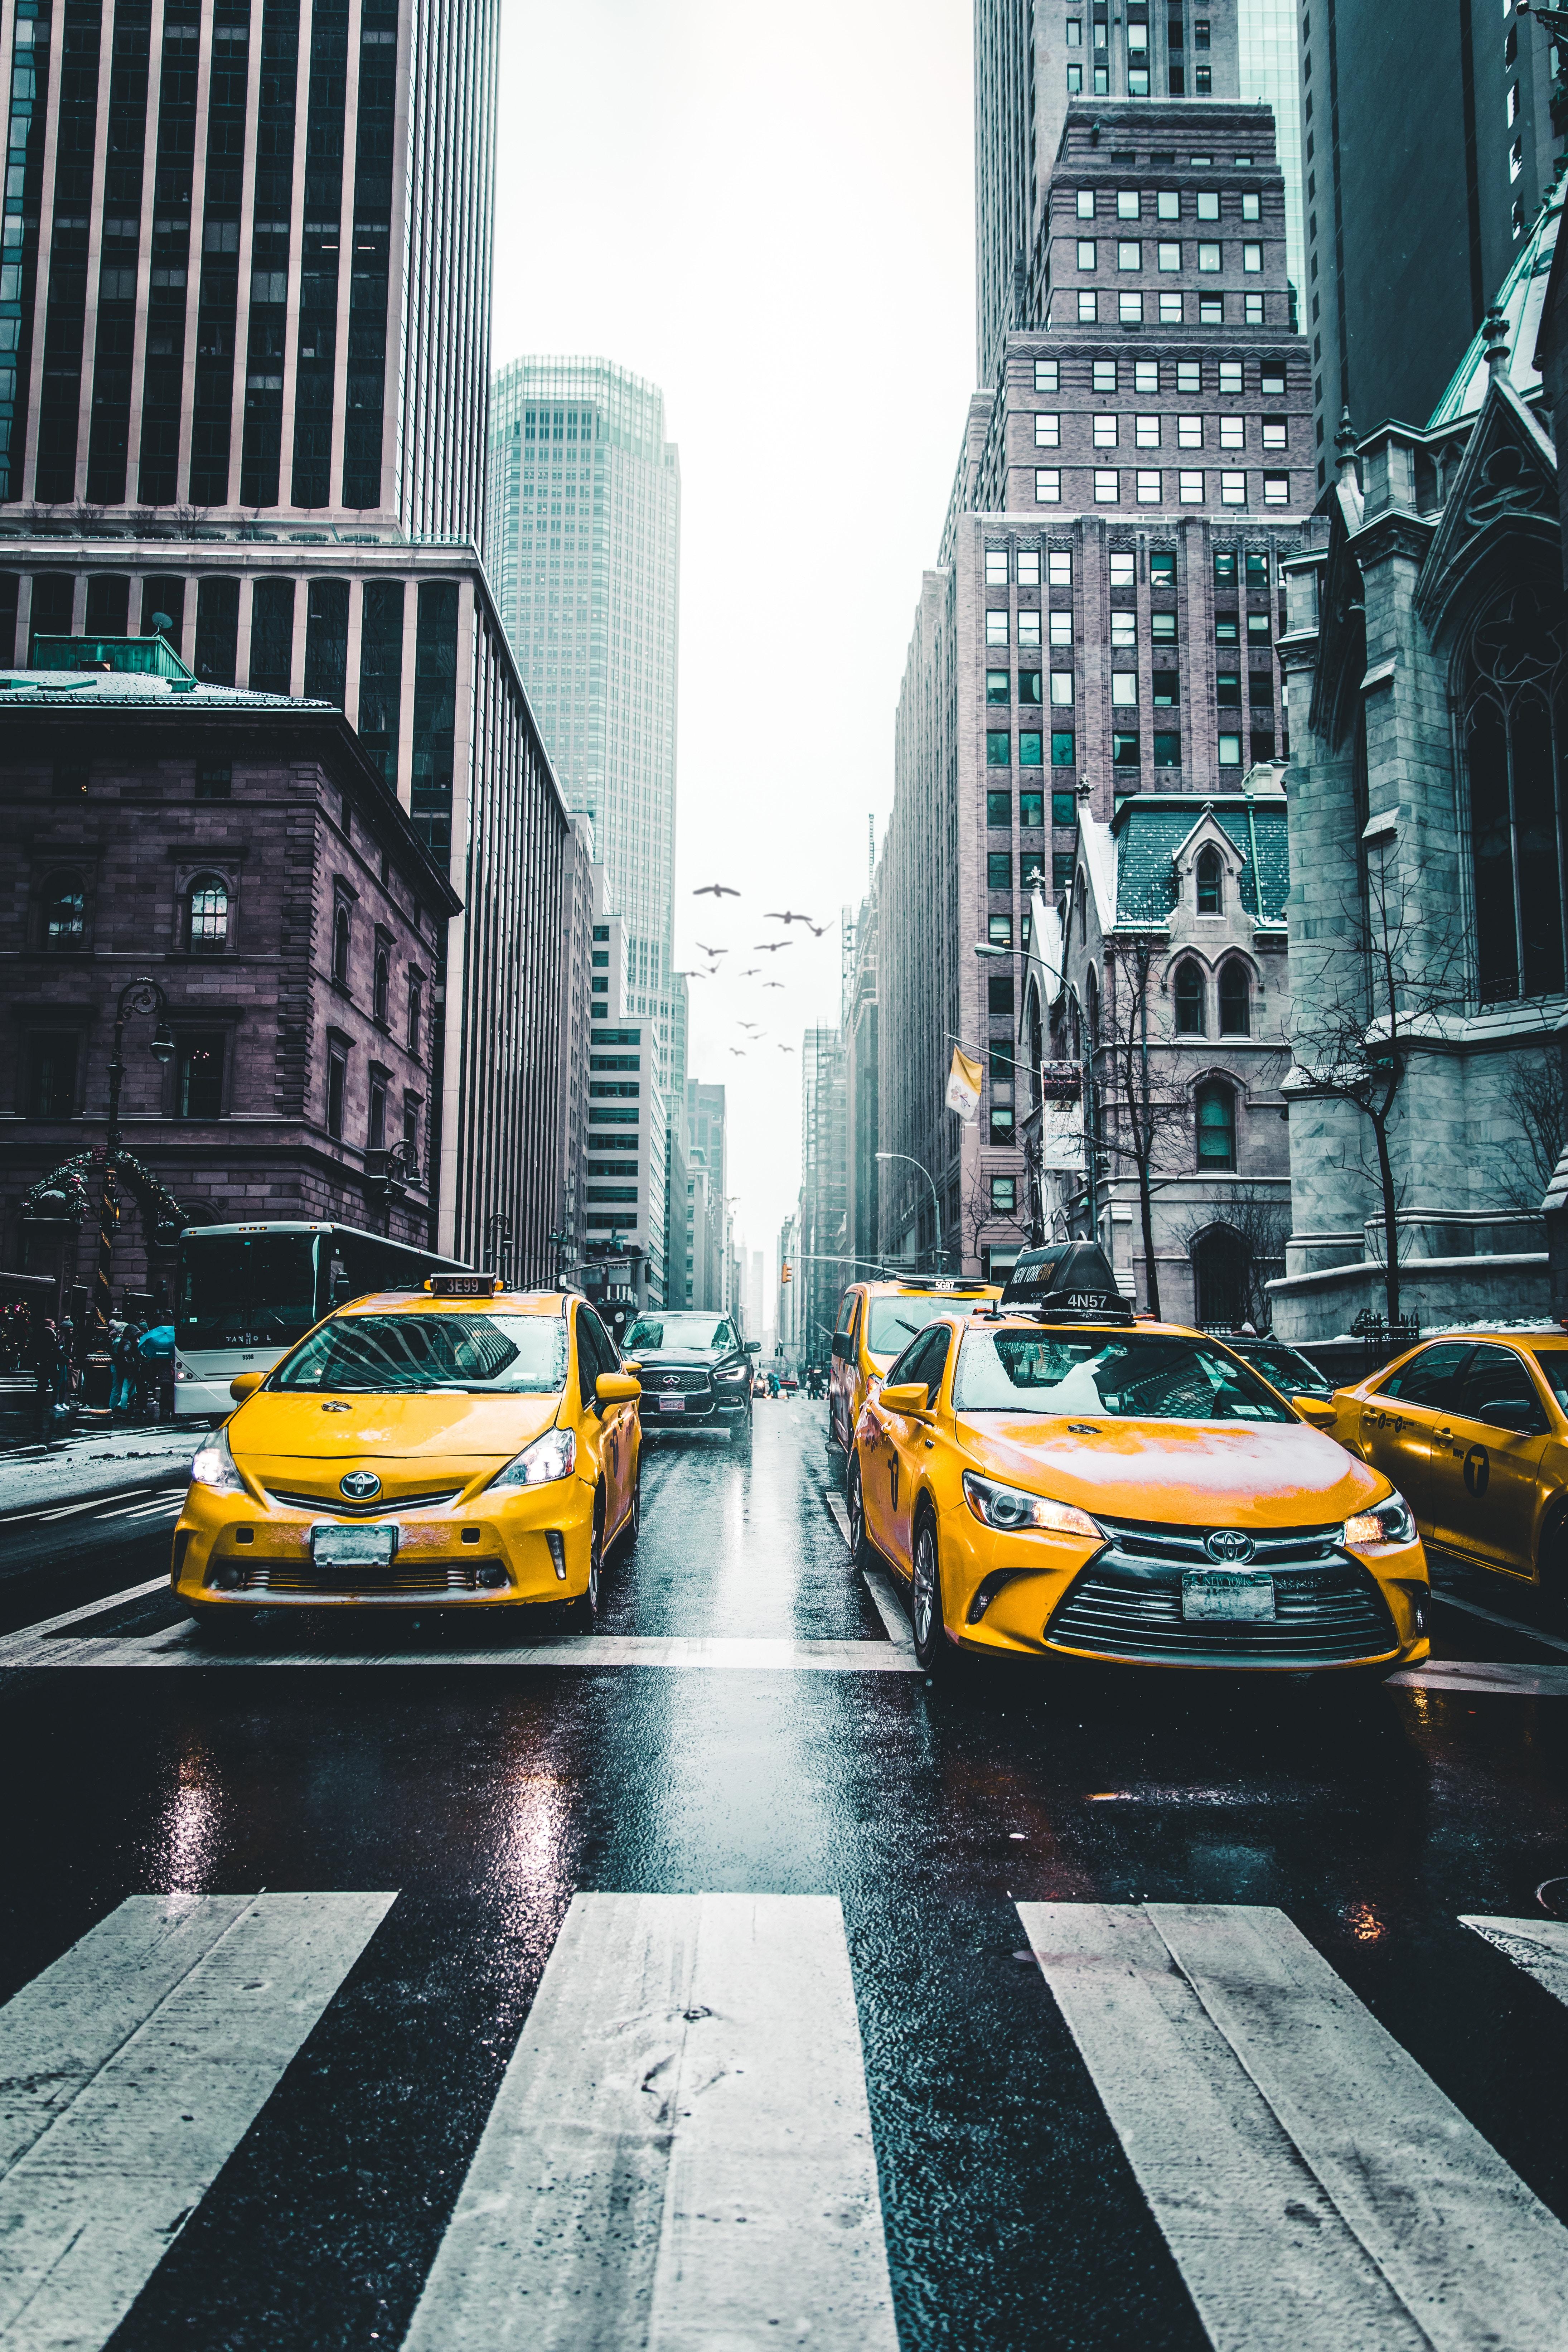 Обои new york city, машины, америка, улица, сша. Города foto 7